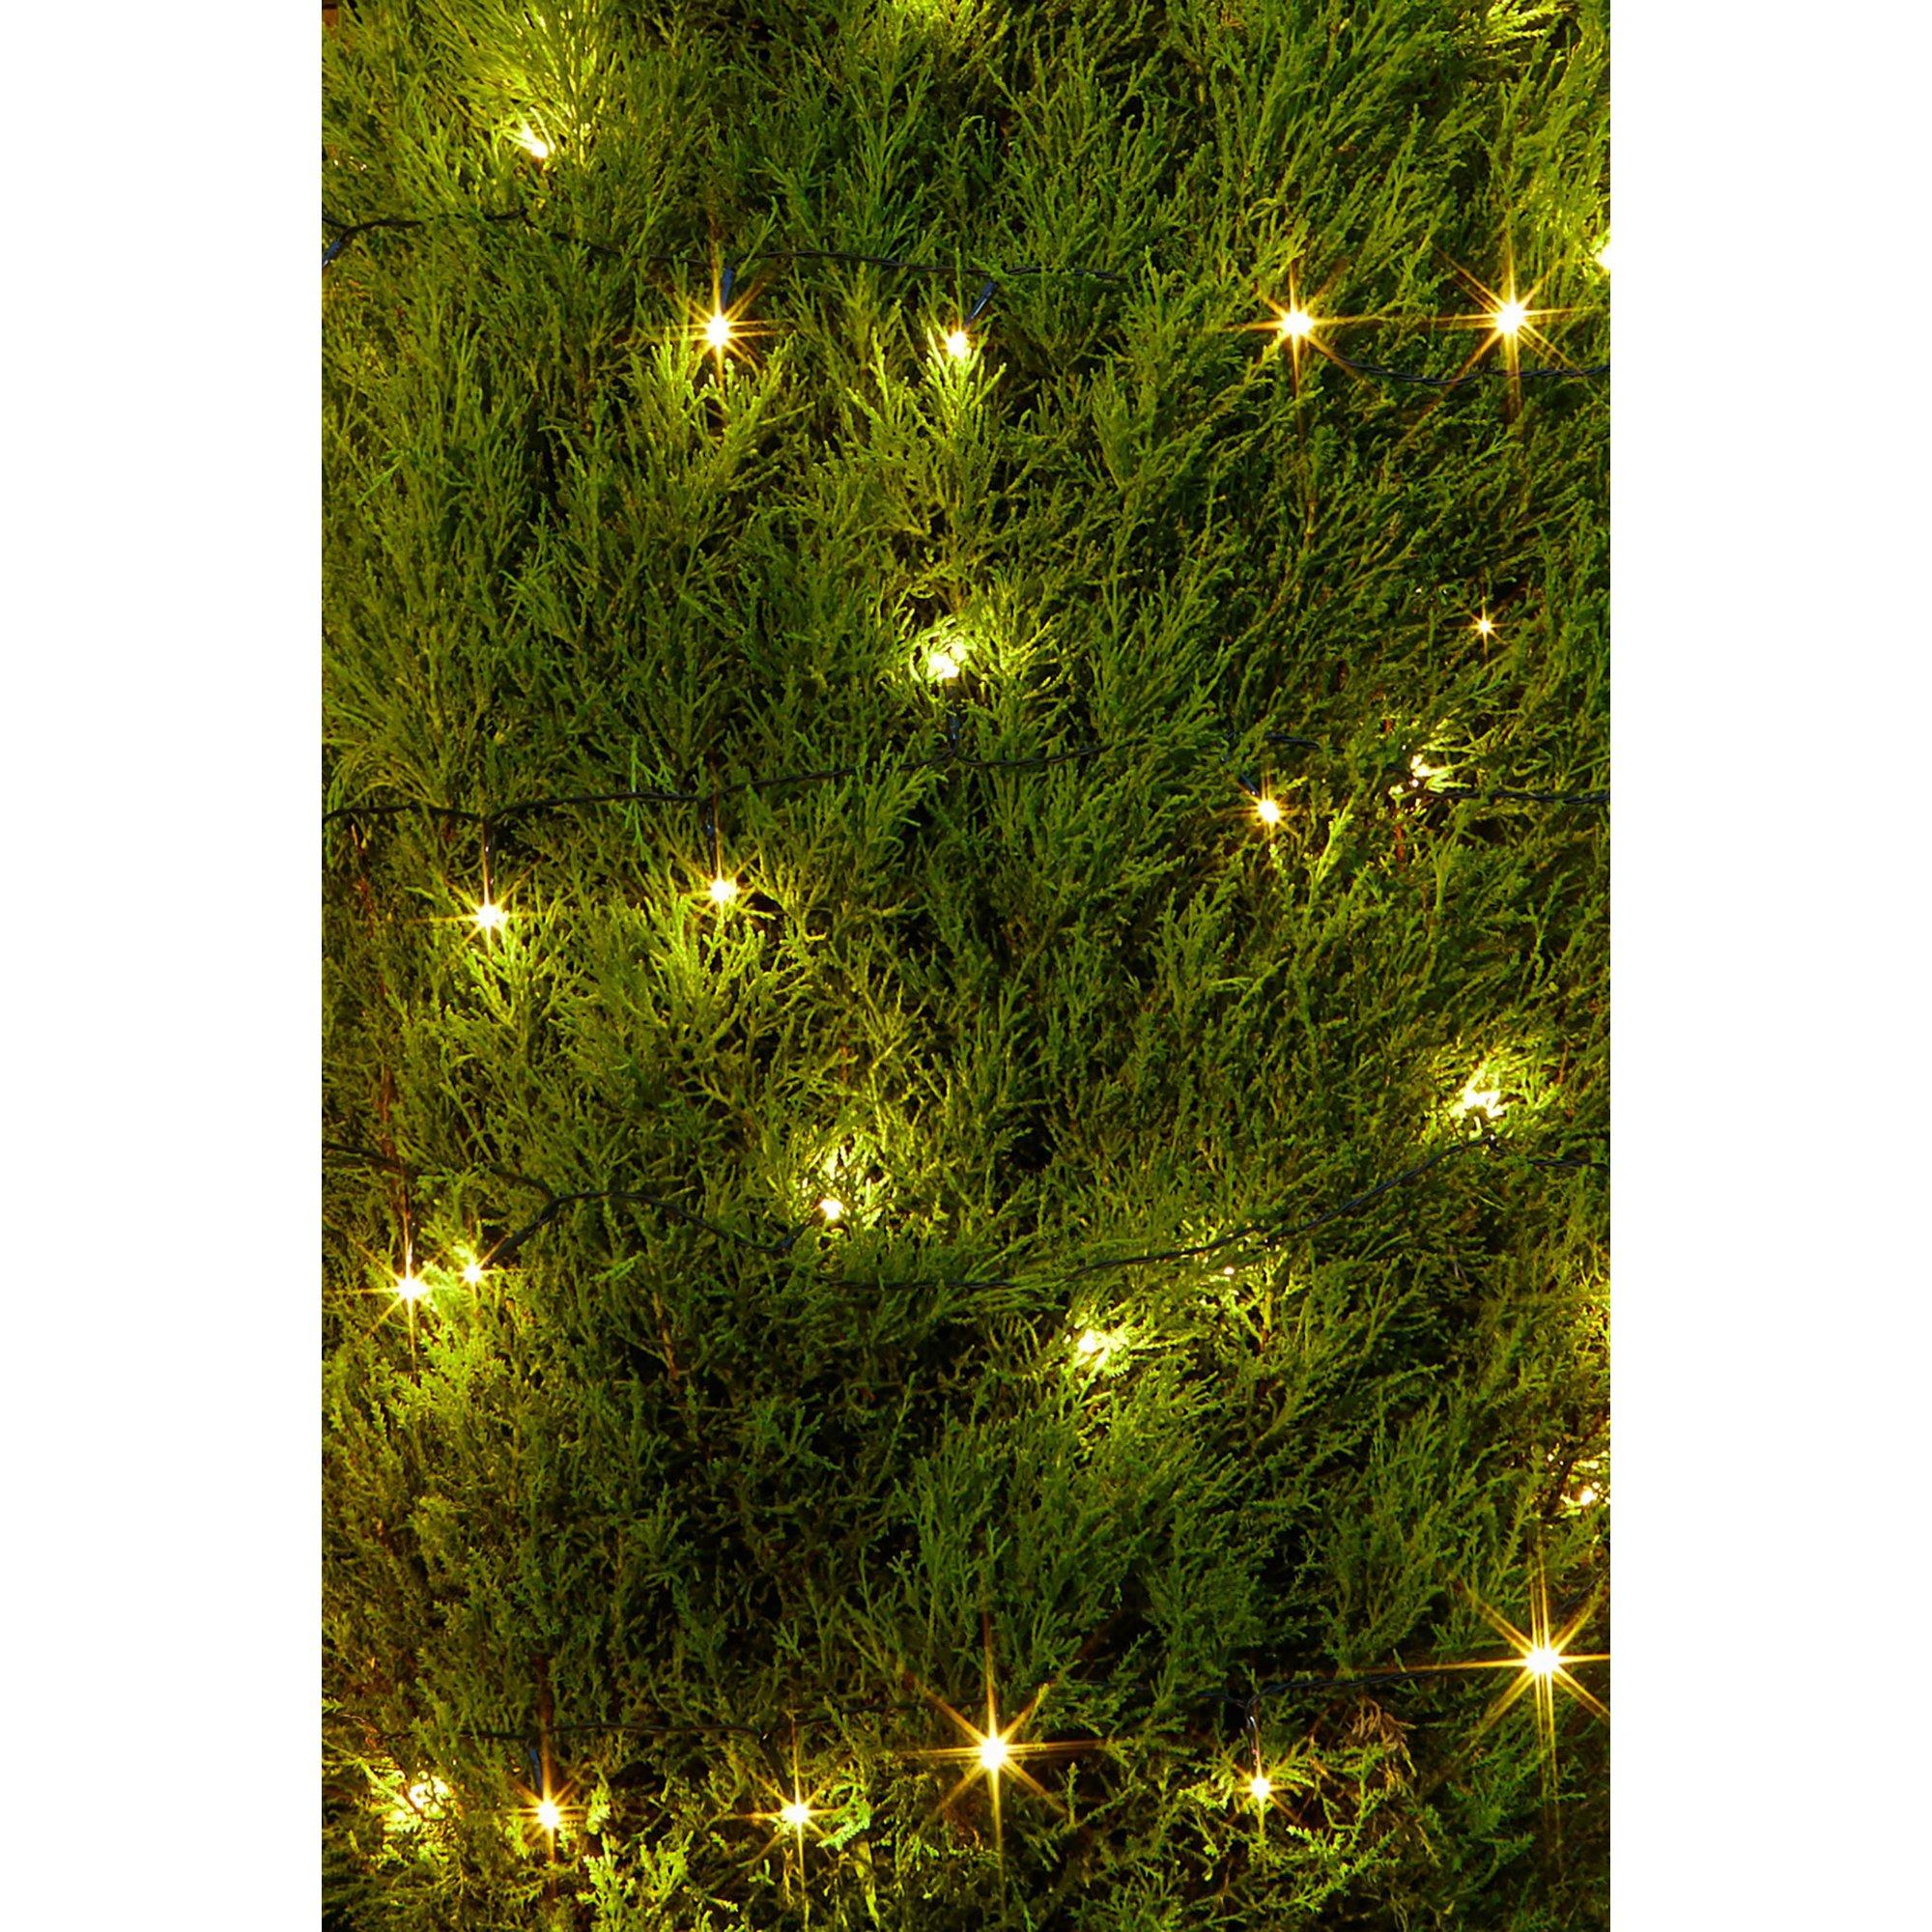 Image of 100 Warm White LED String Lights